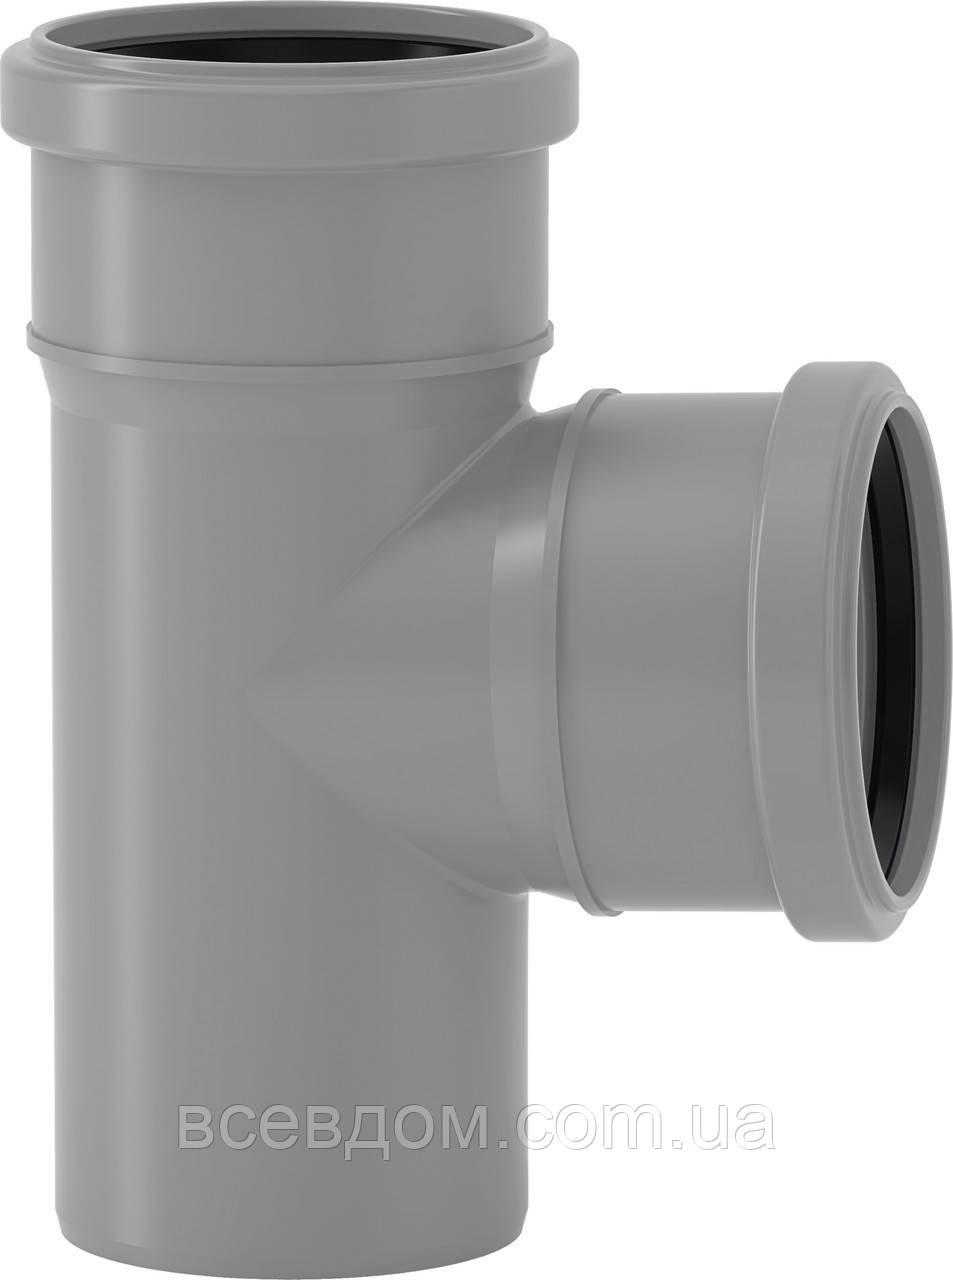 HTEA тройник Valsir внутренней канализации 32/32х87°